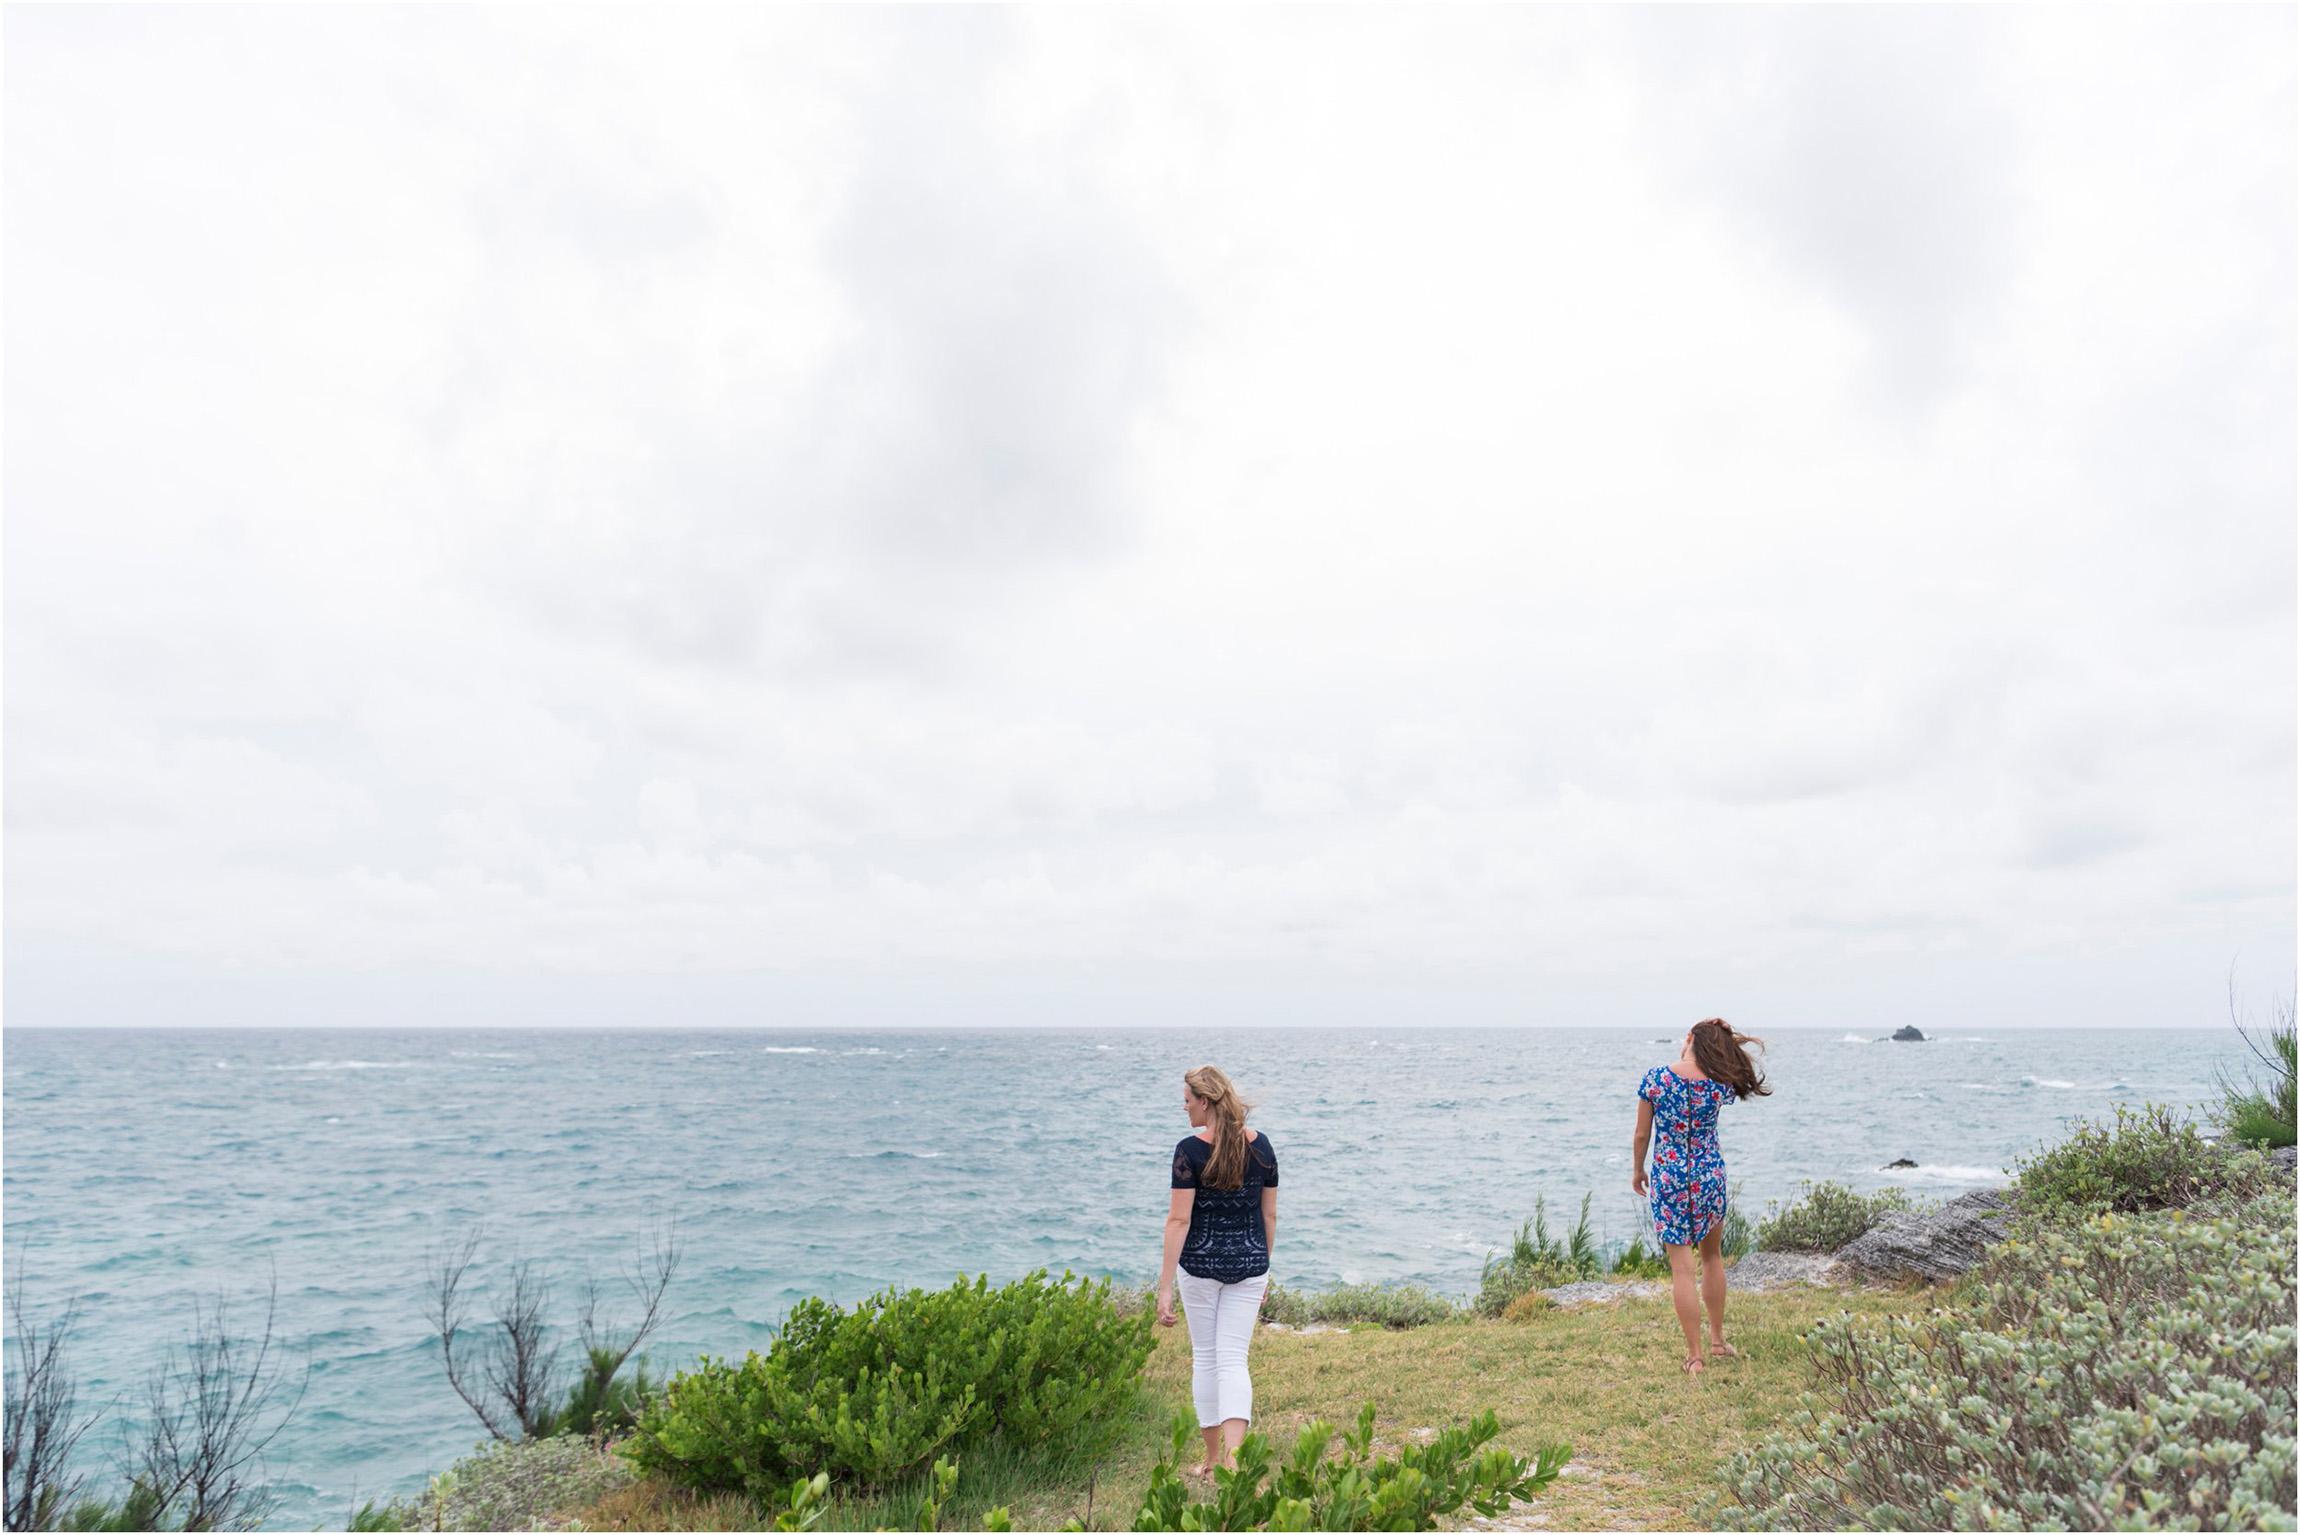 ©FianderFoto_Bermuda Photographer_bachelorette_009.jpg